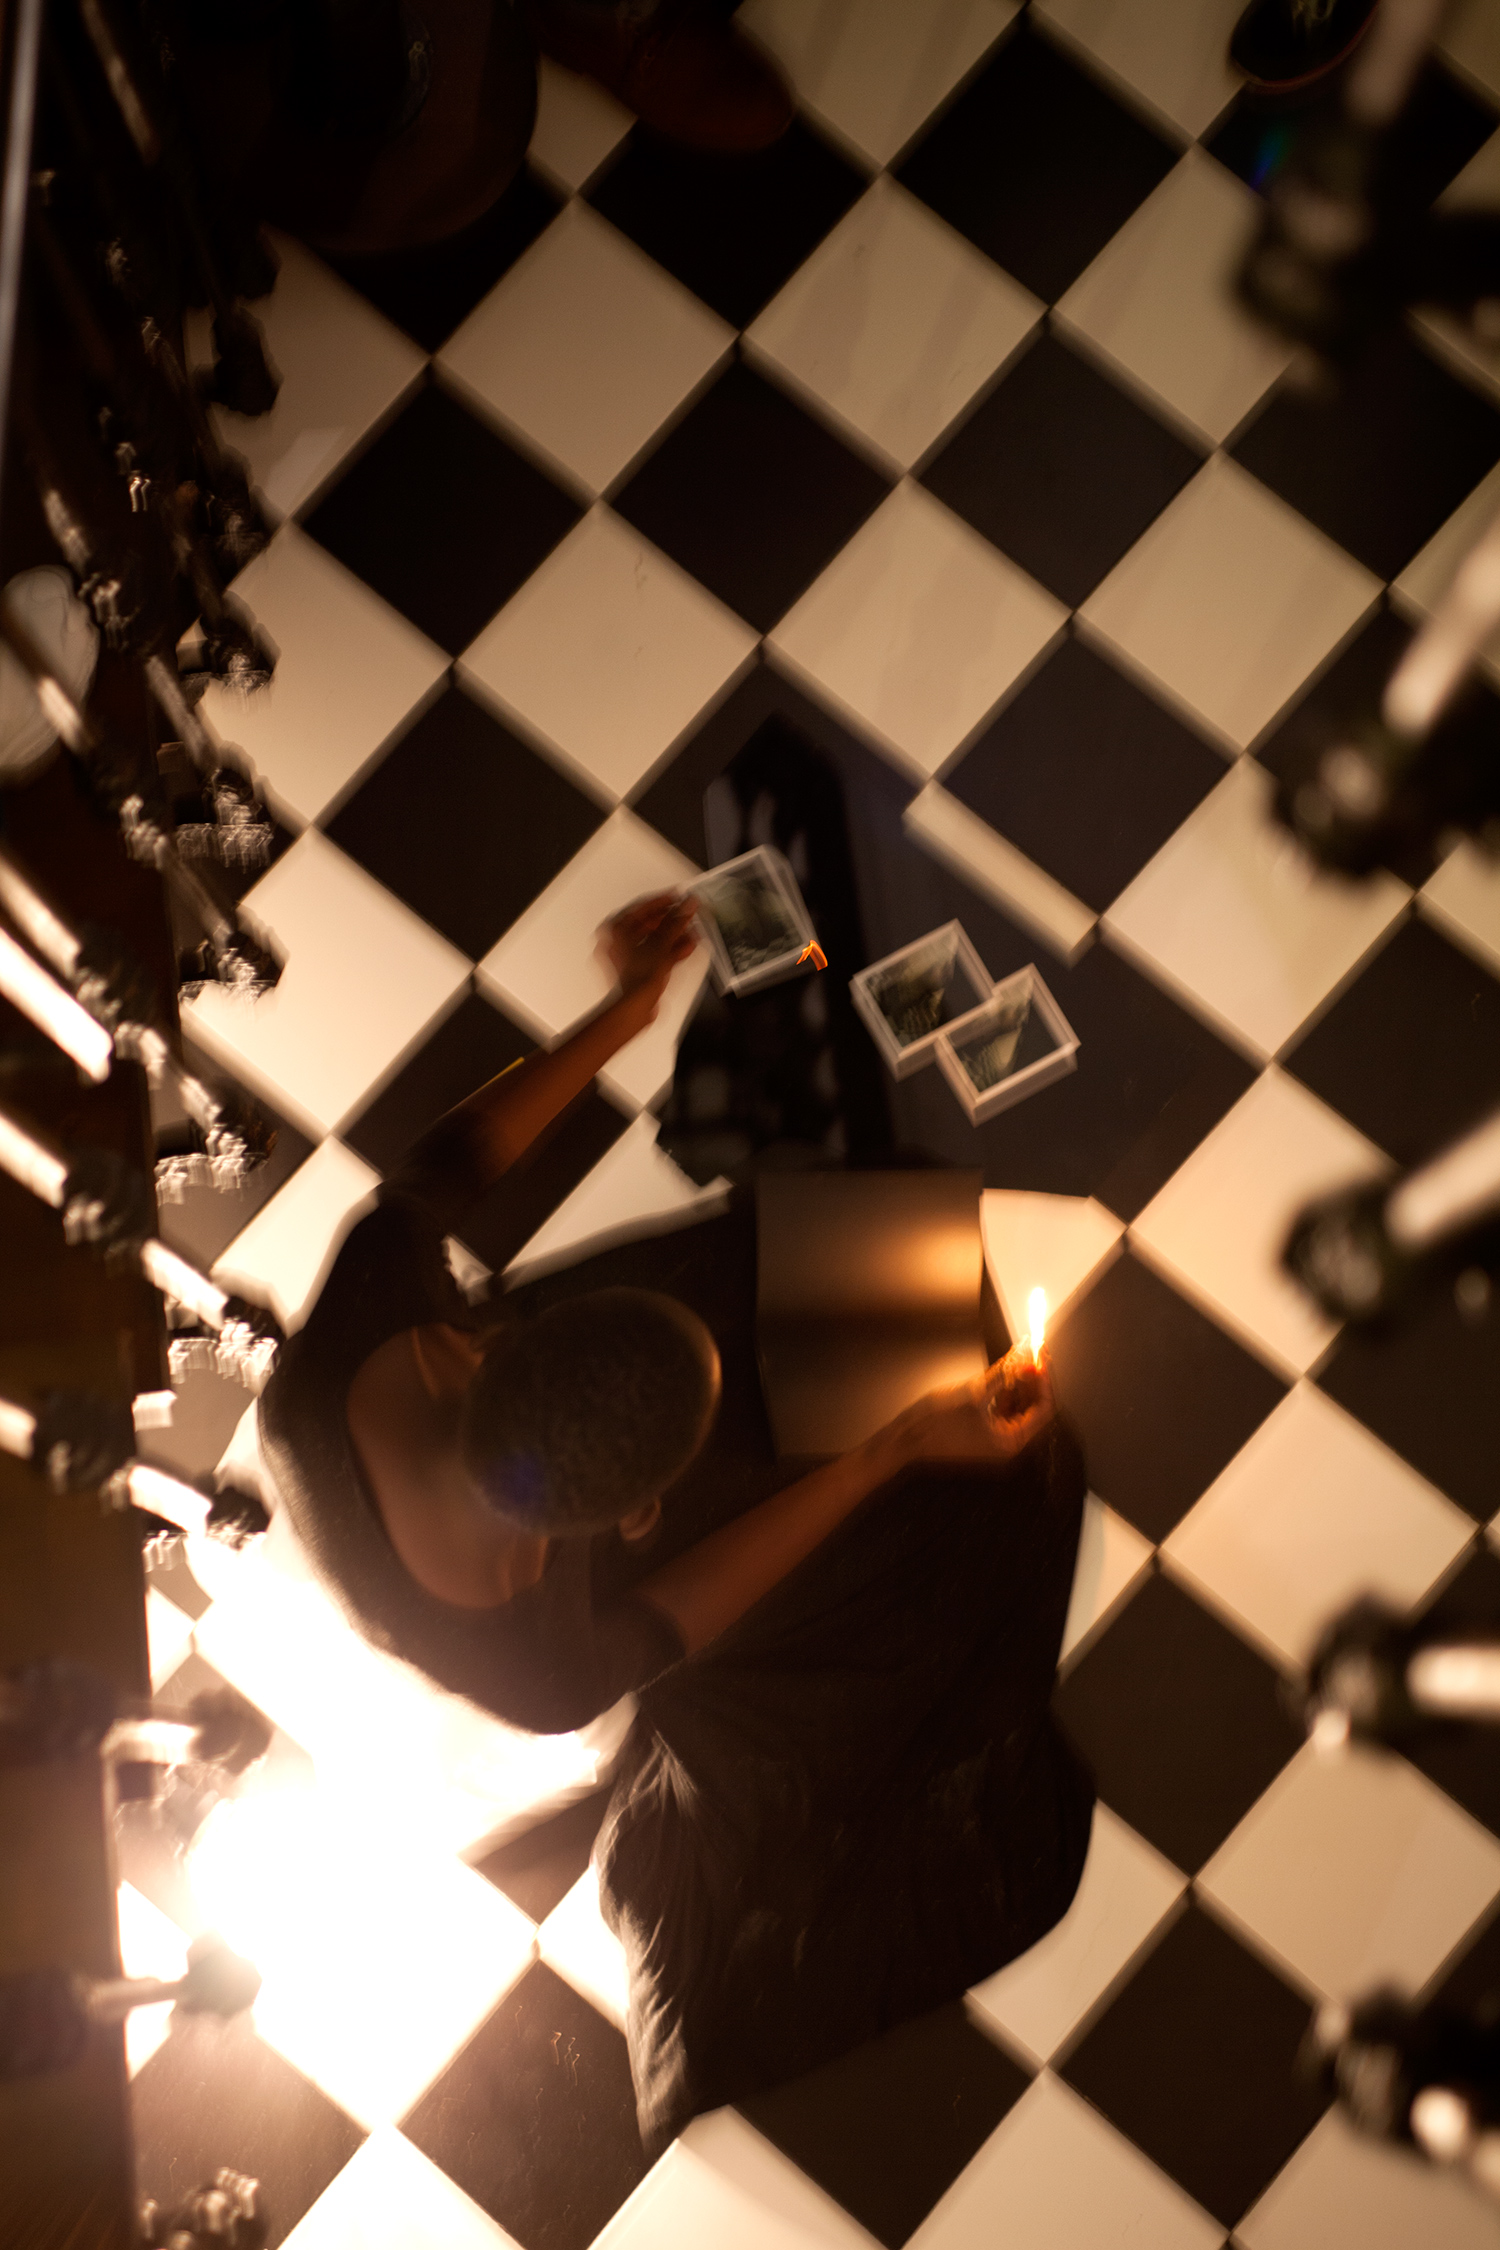 image-carlos mate-hotel room-4.jpg alt=carlos mate art installation and performance hotel room